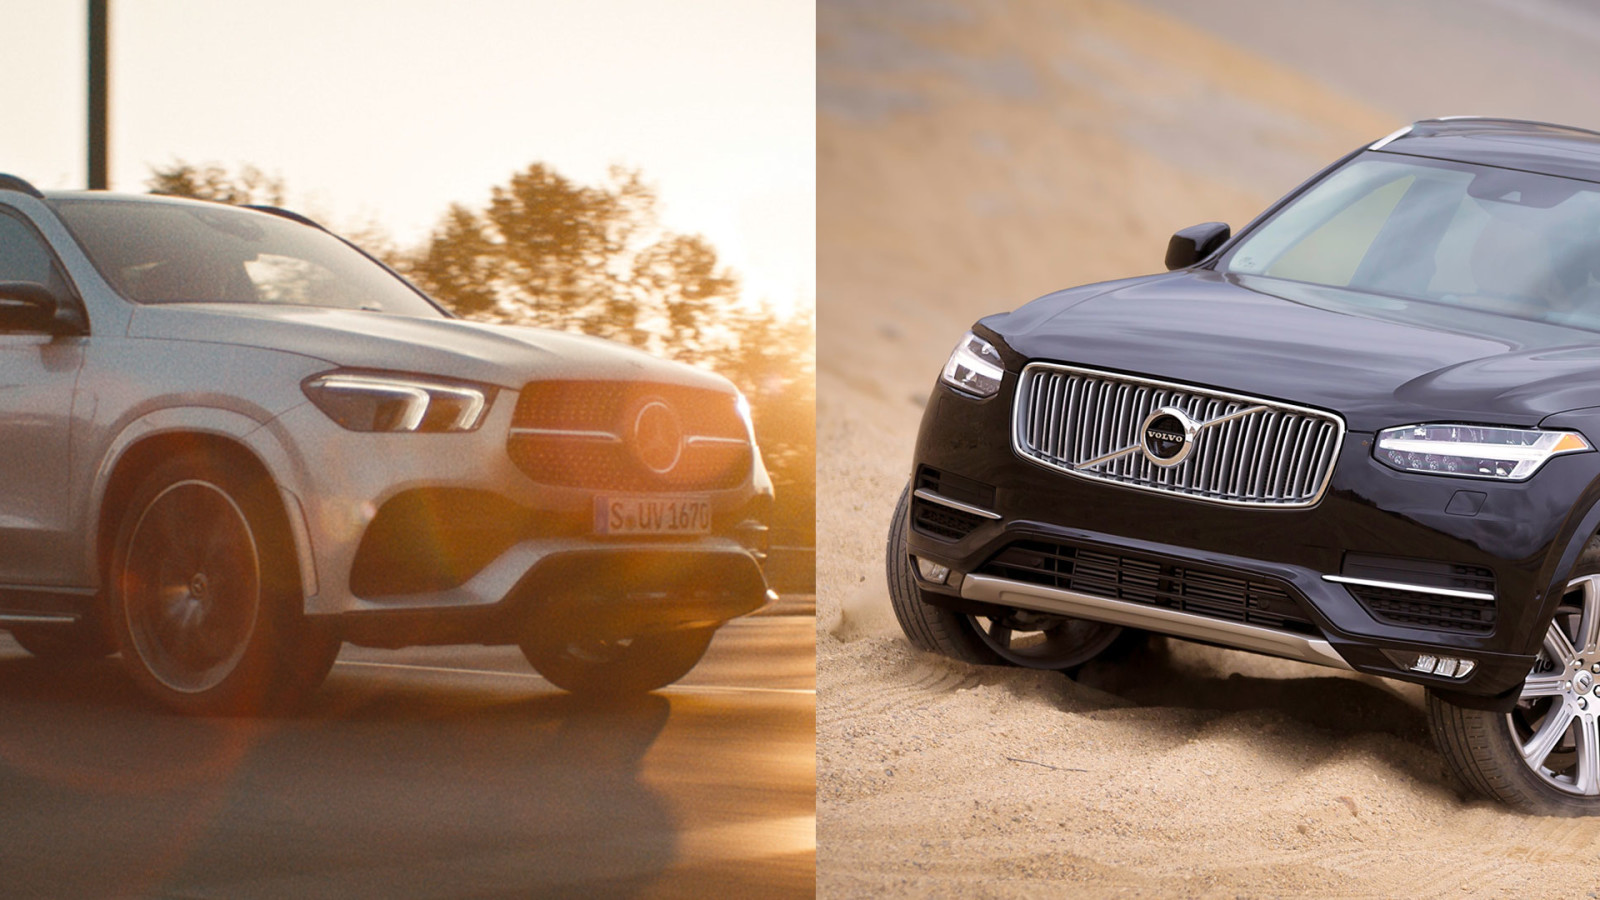 Mercedes Benz GLE vs Volvo XC90